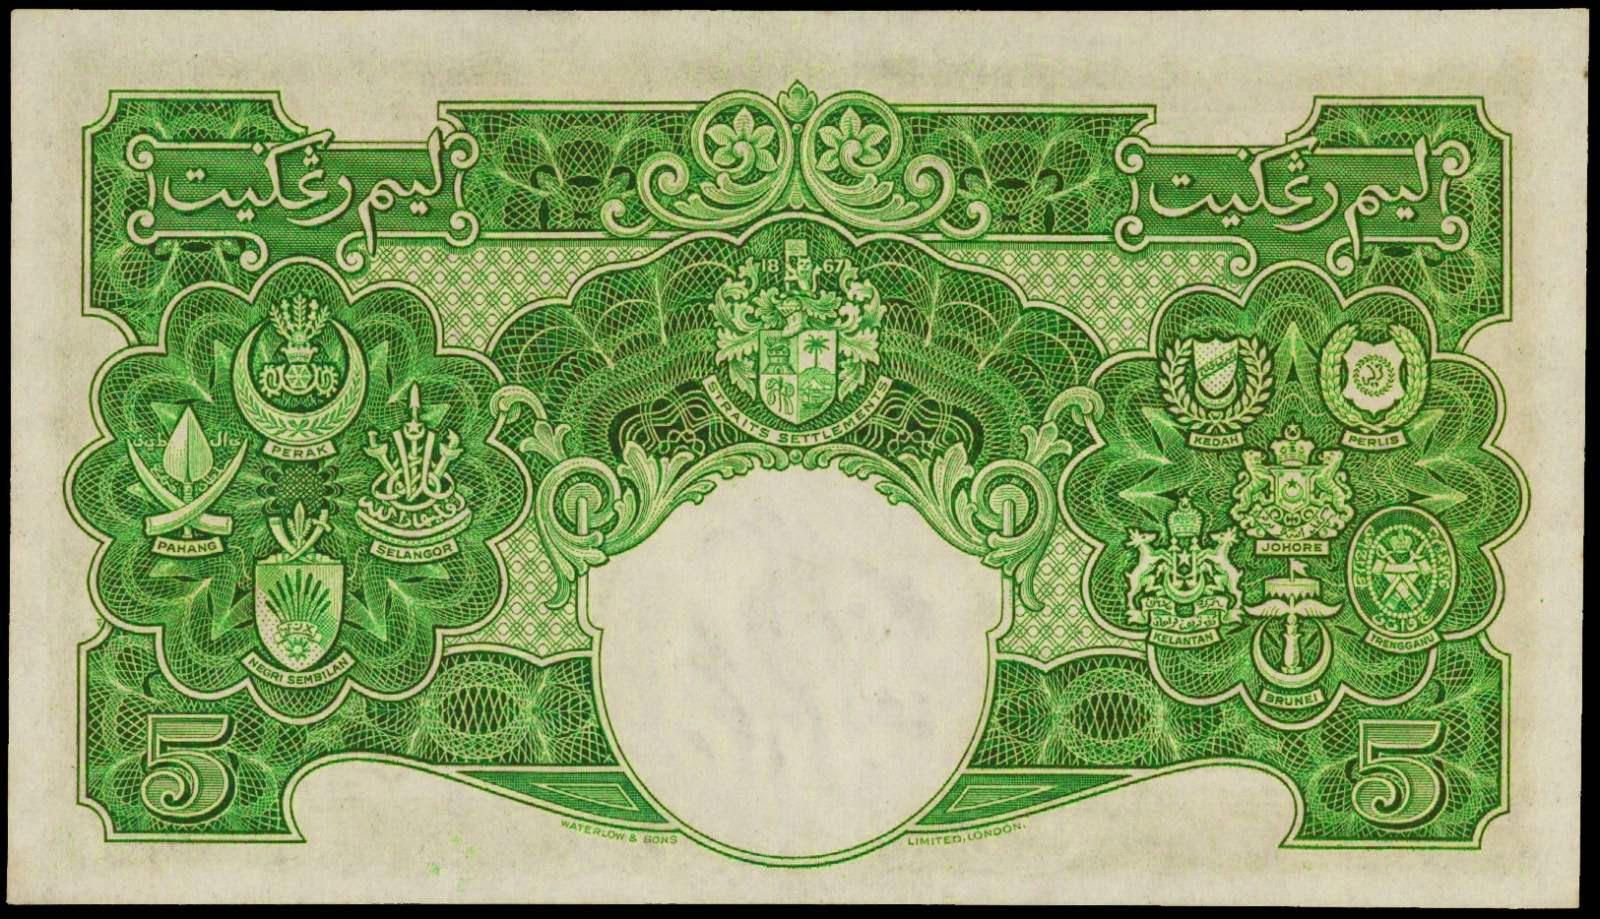 Malaya paper money 5 Dollar Note 1941